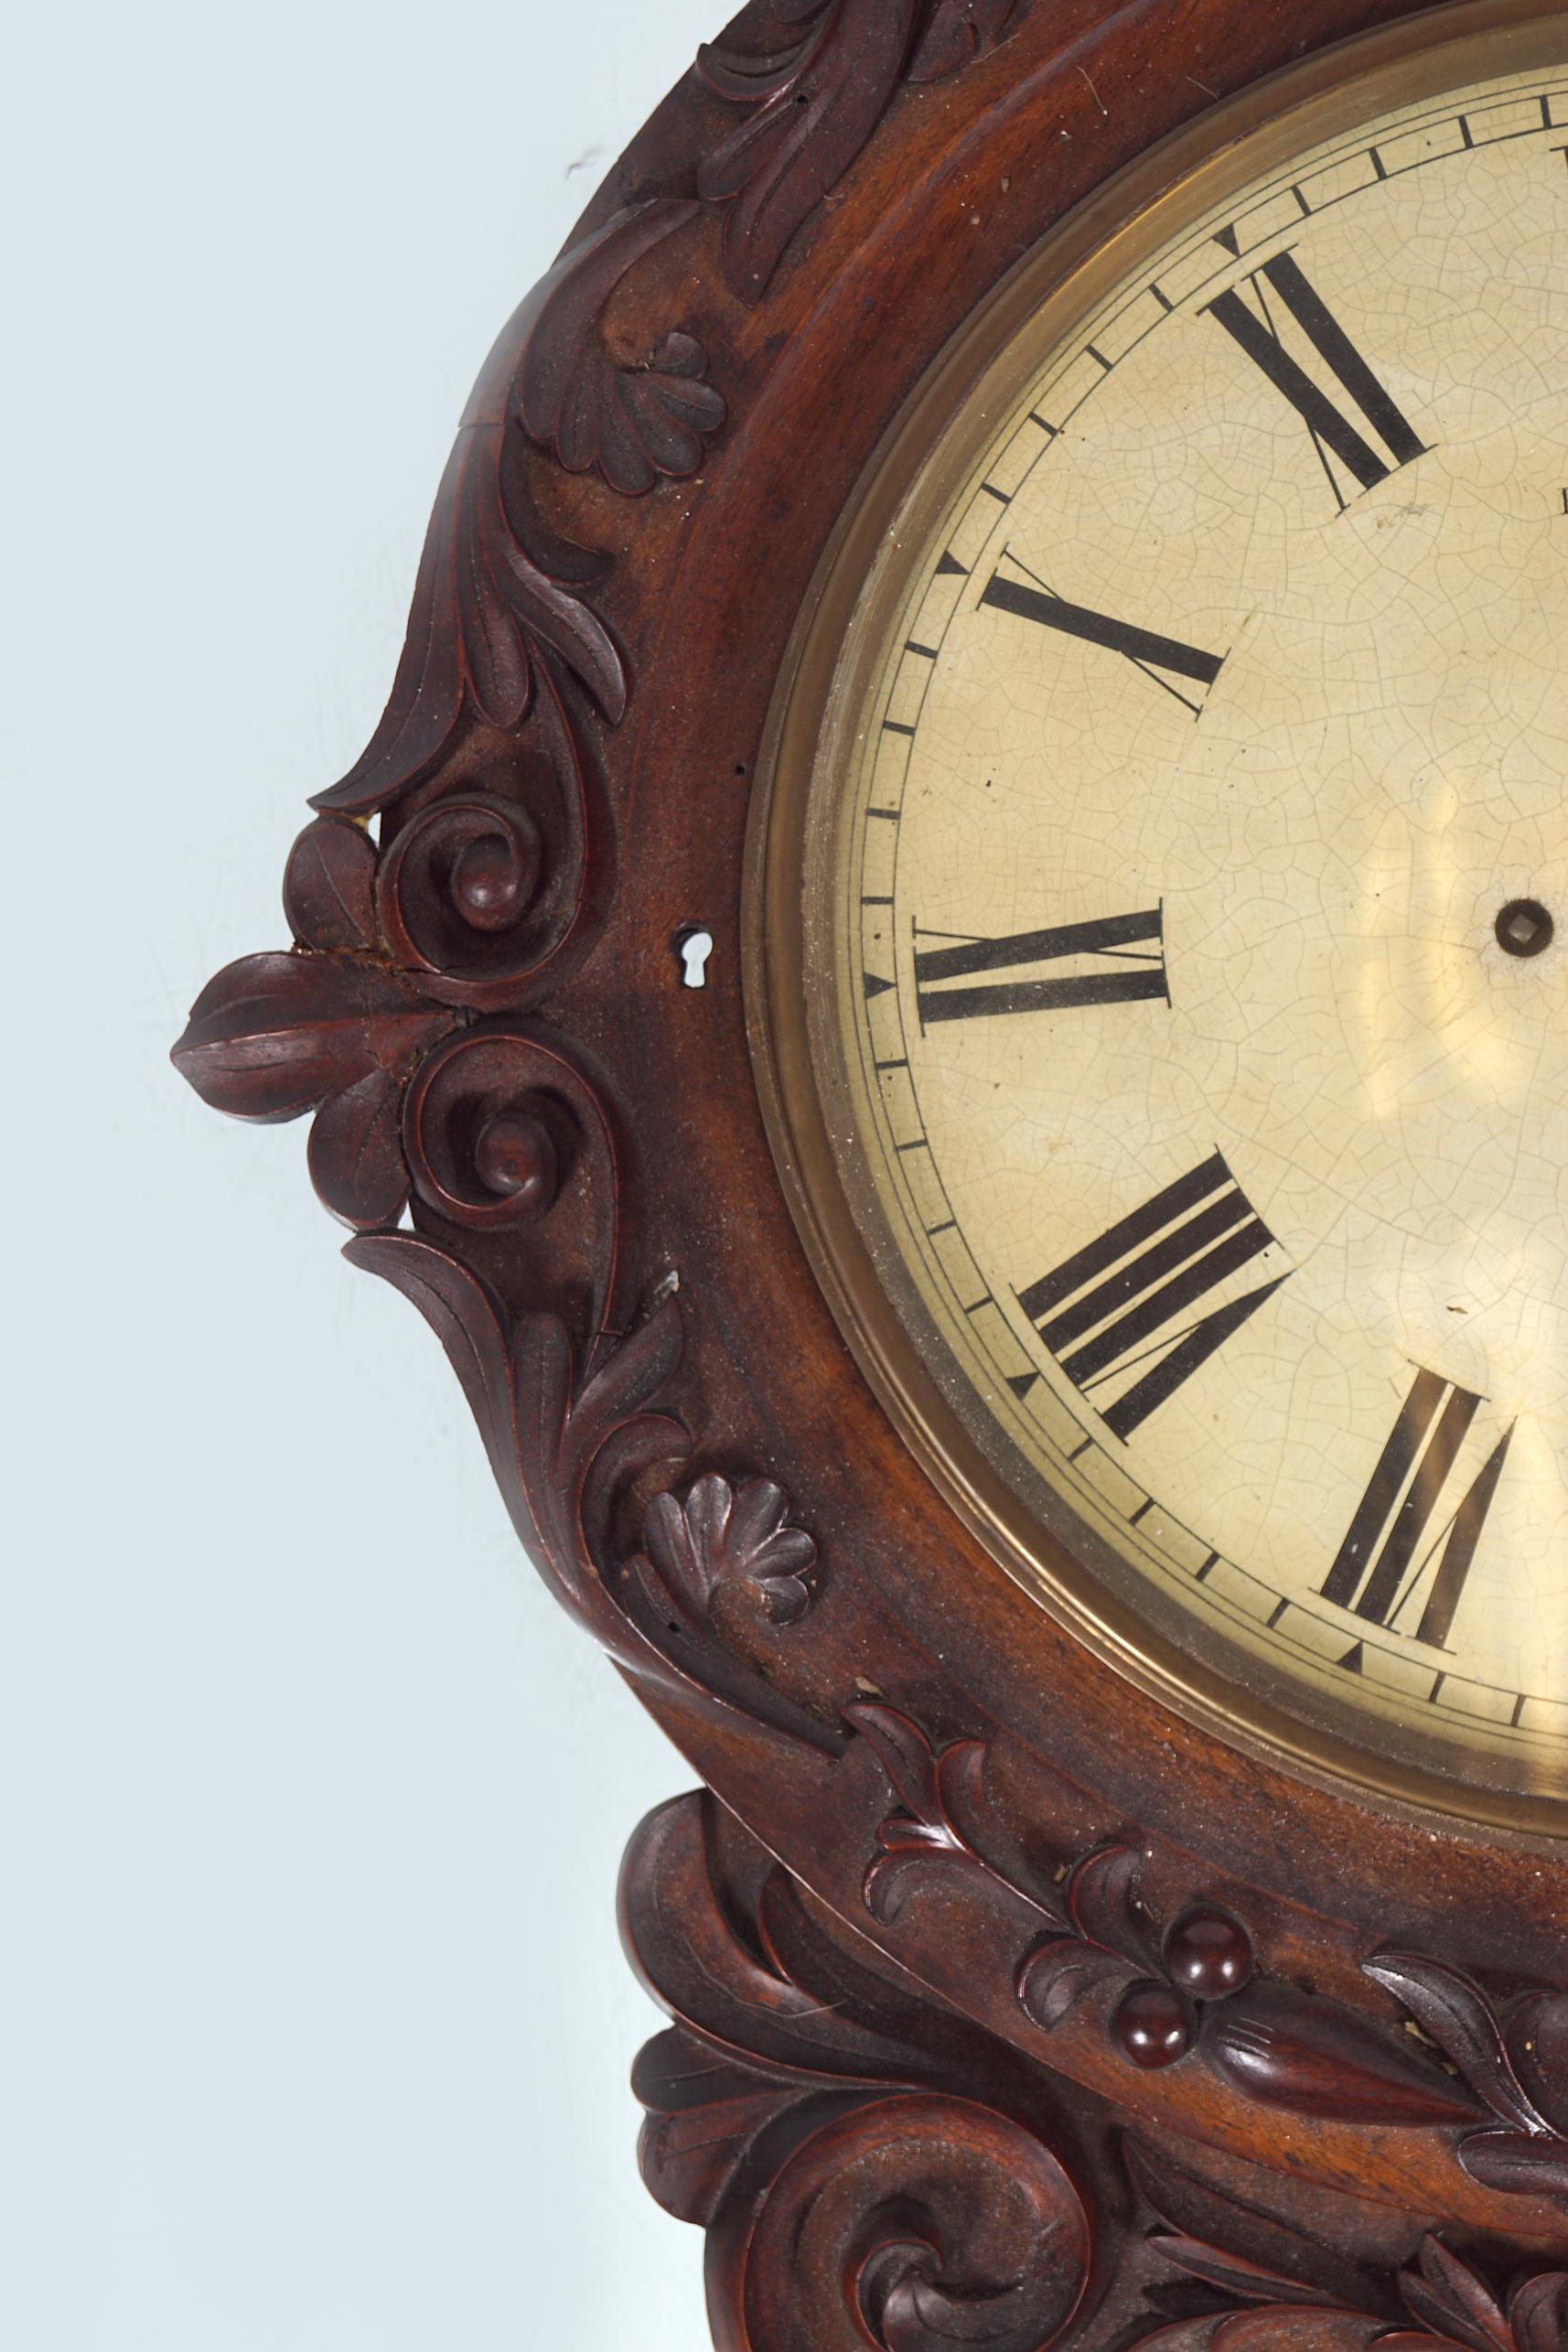 LARGE 19TH-CENTURY MAHOGANY DROP DIAL WALL CLOCK - Image 3 of 4